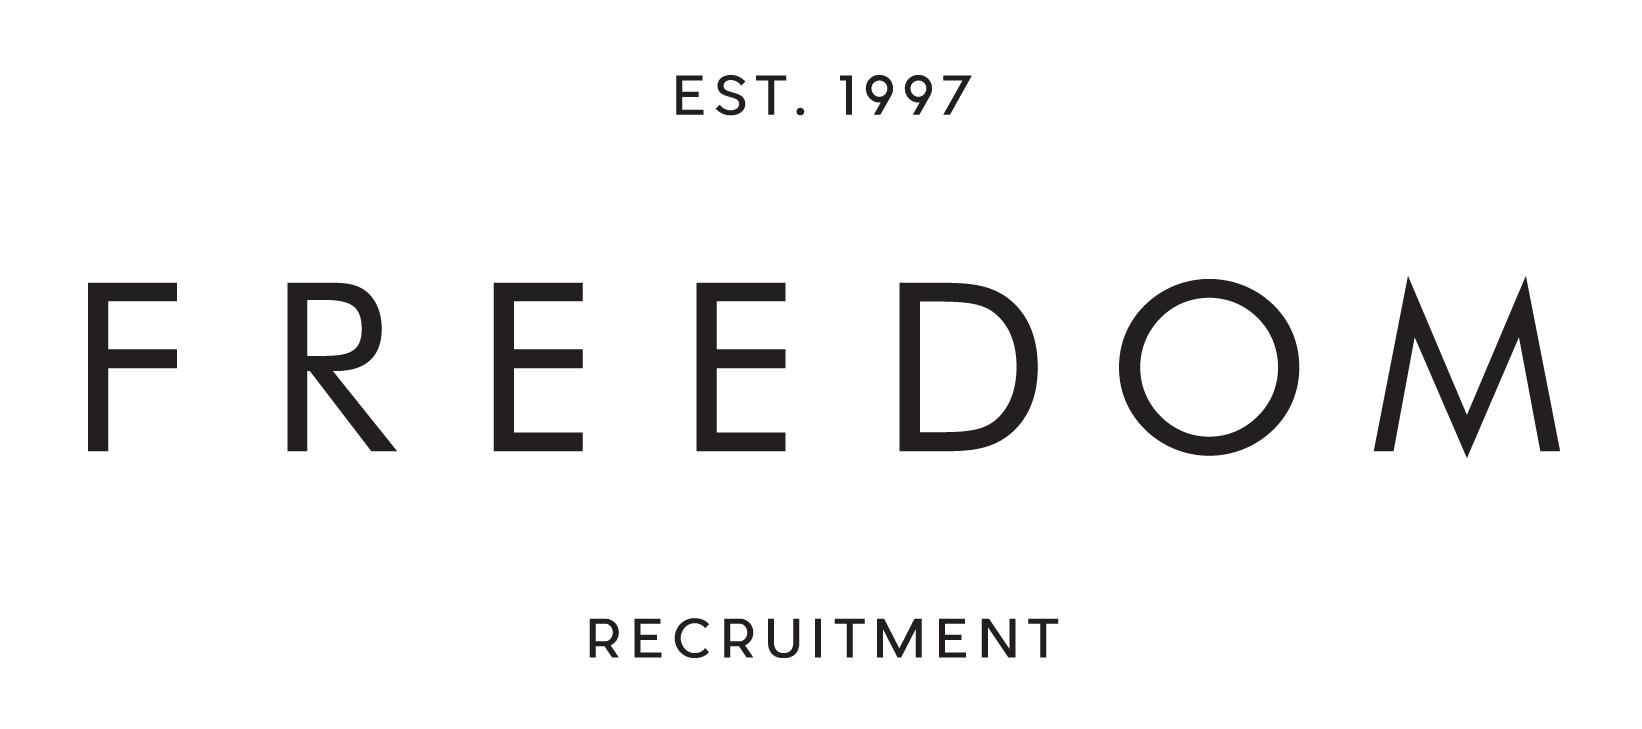 Fashion Recruitment Agencies London Uk